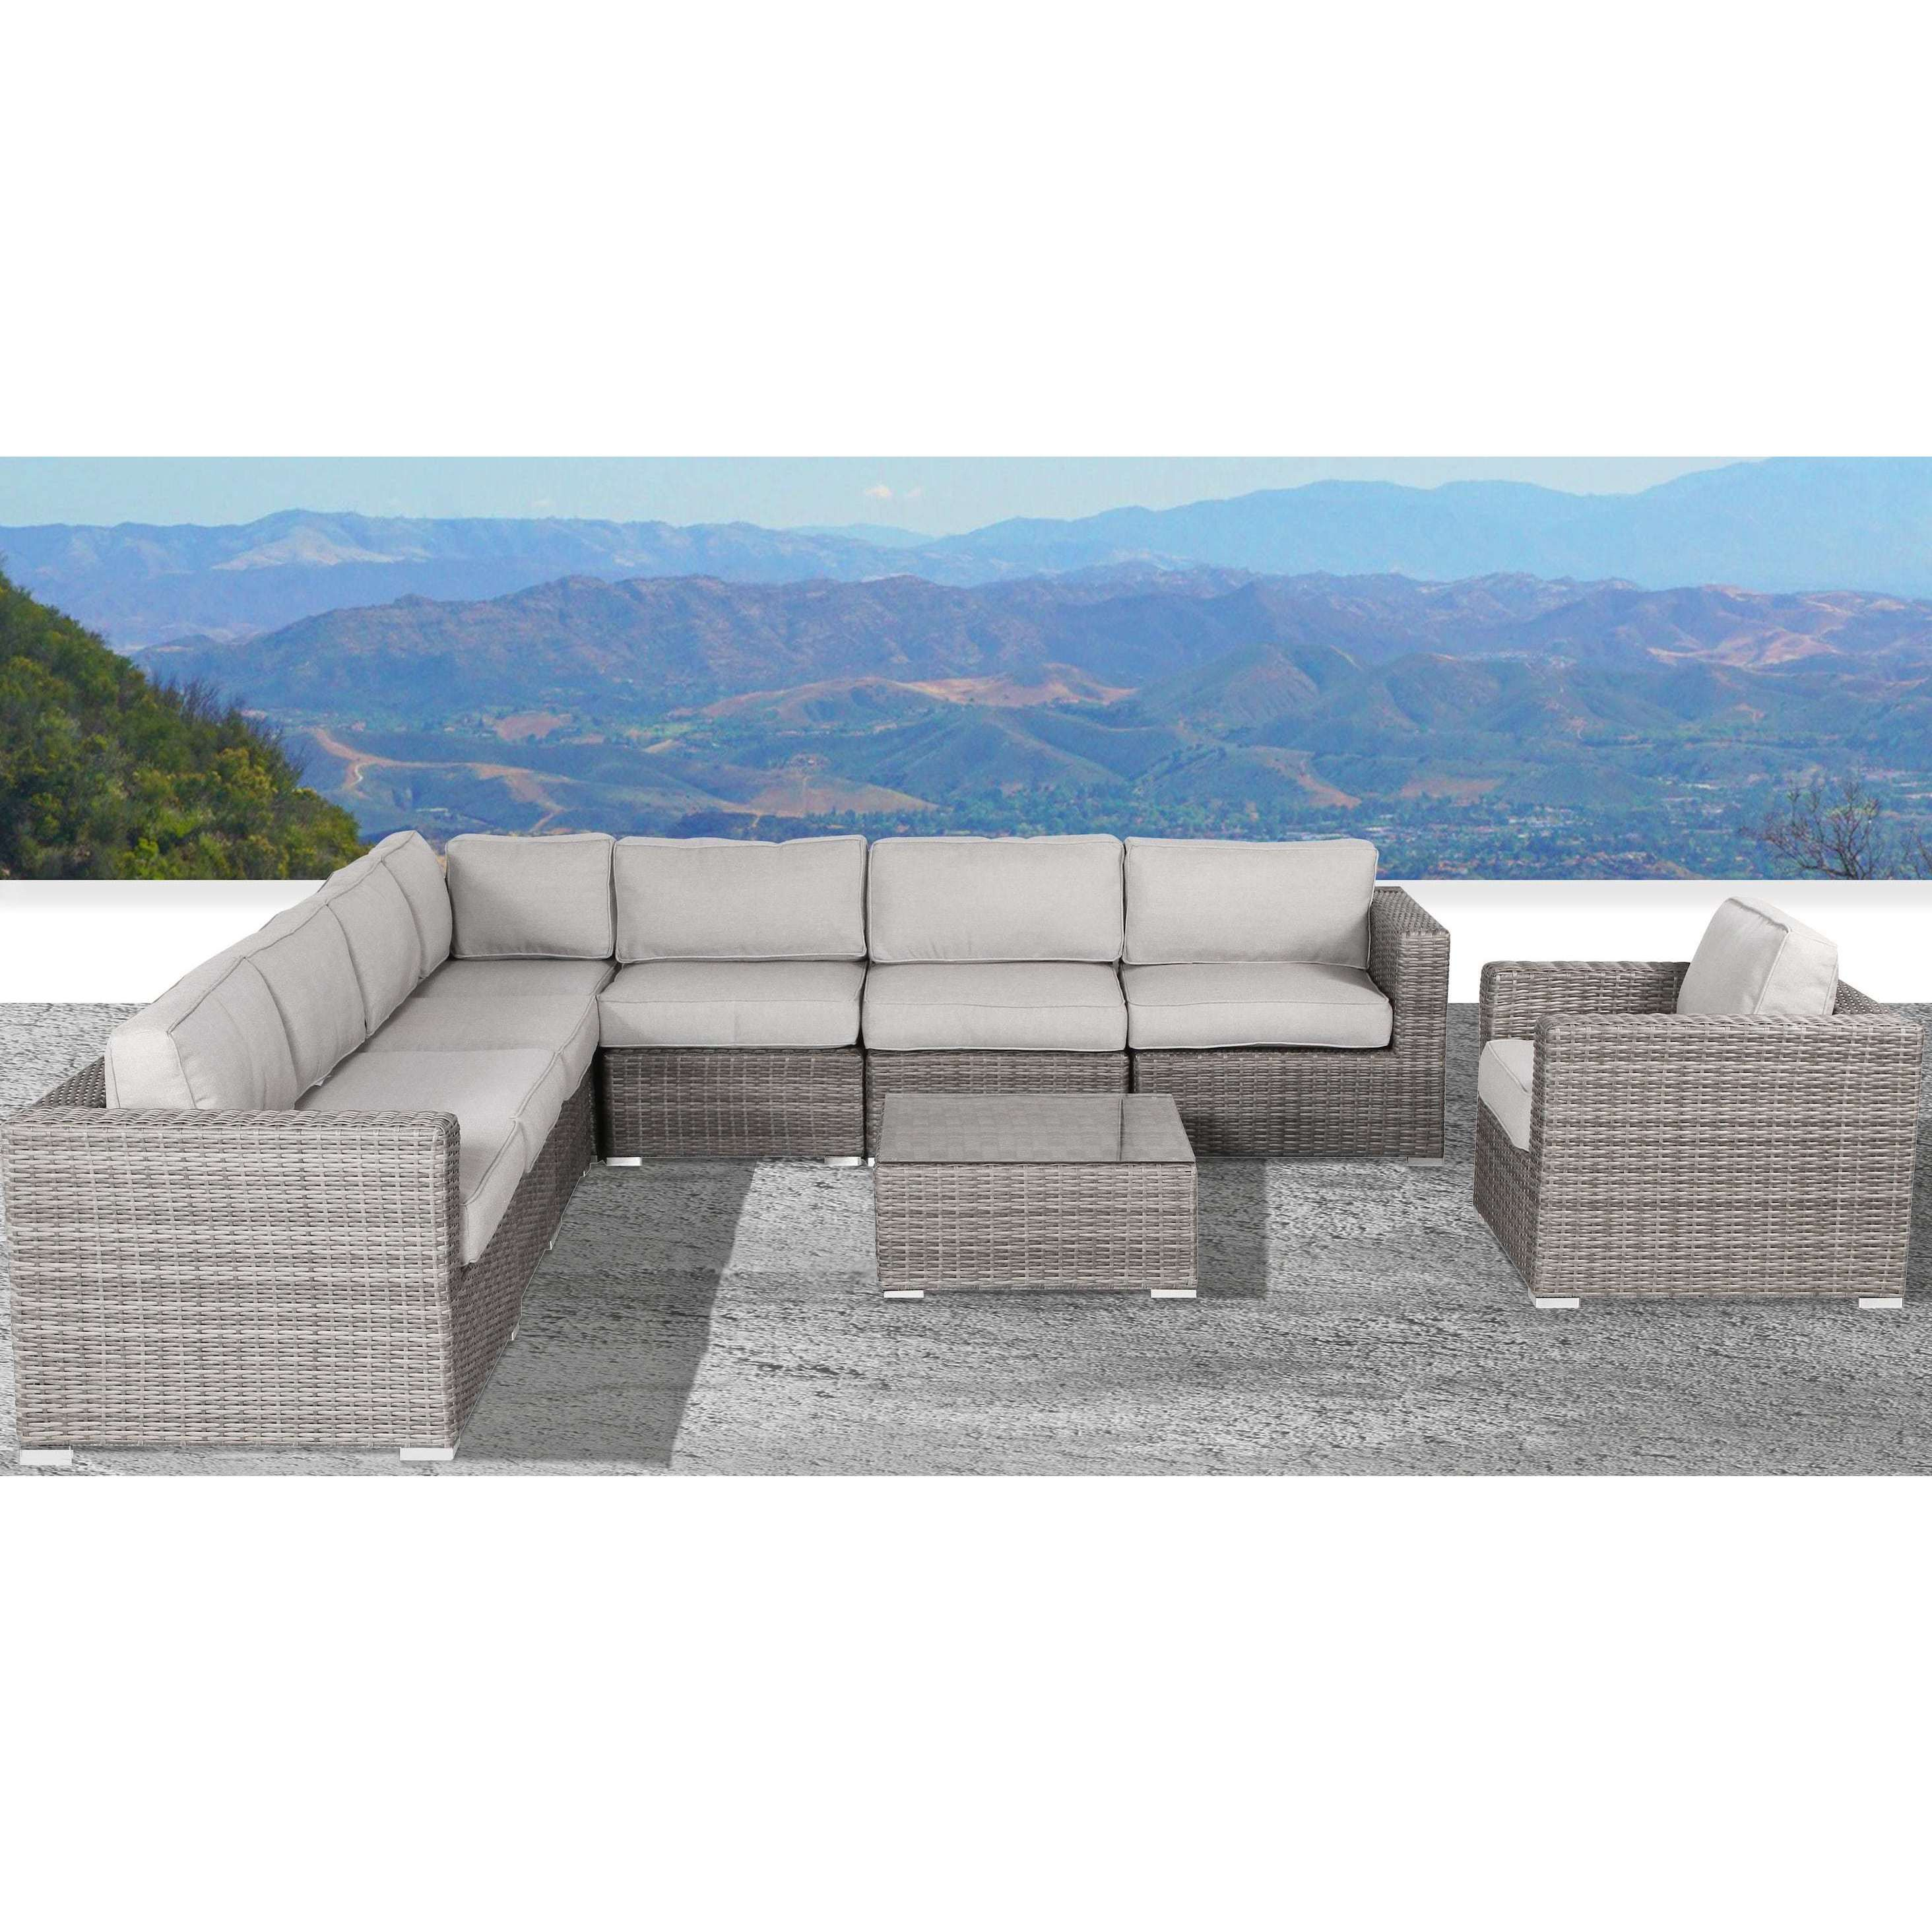 Elegant Living Source International Verona Wicker 8 Piece Deep Seating Group With  Cushion (Grey Strands